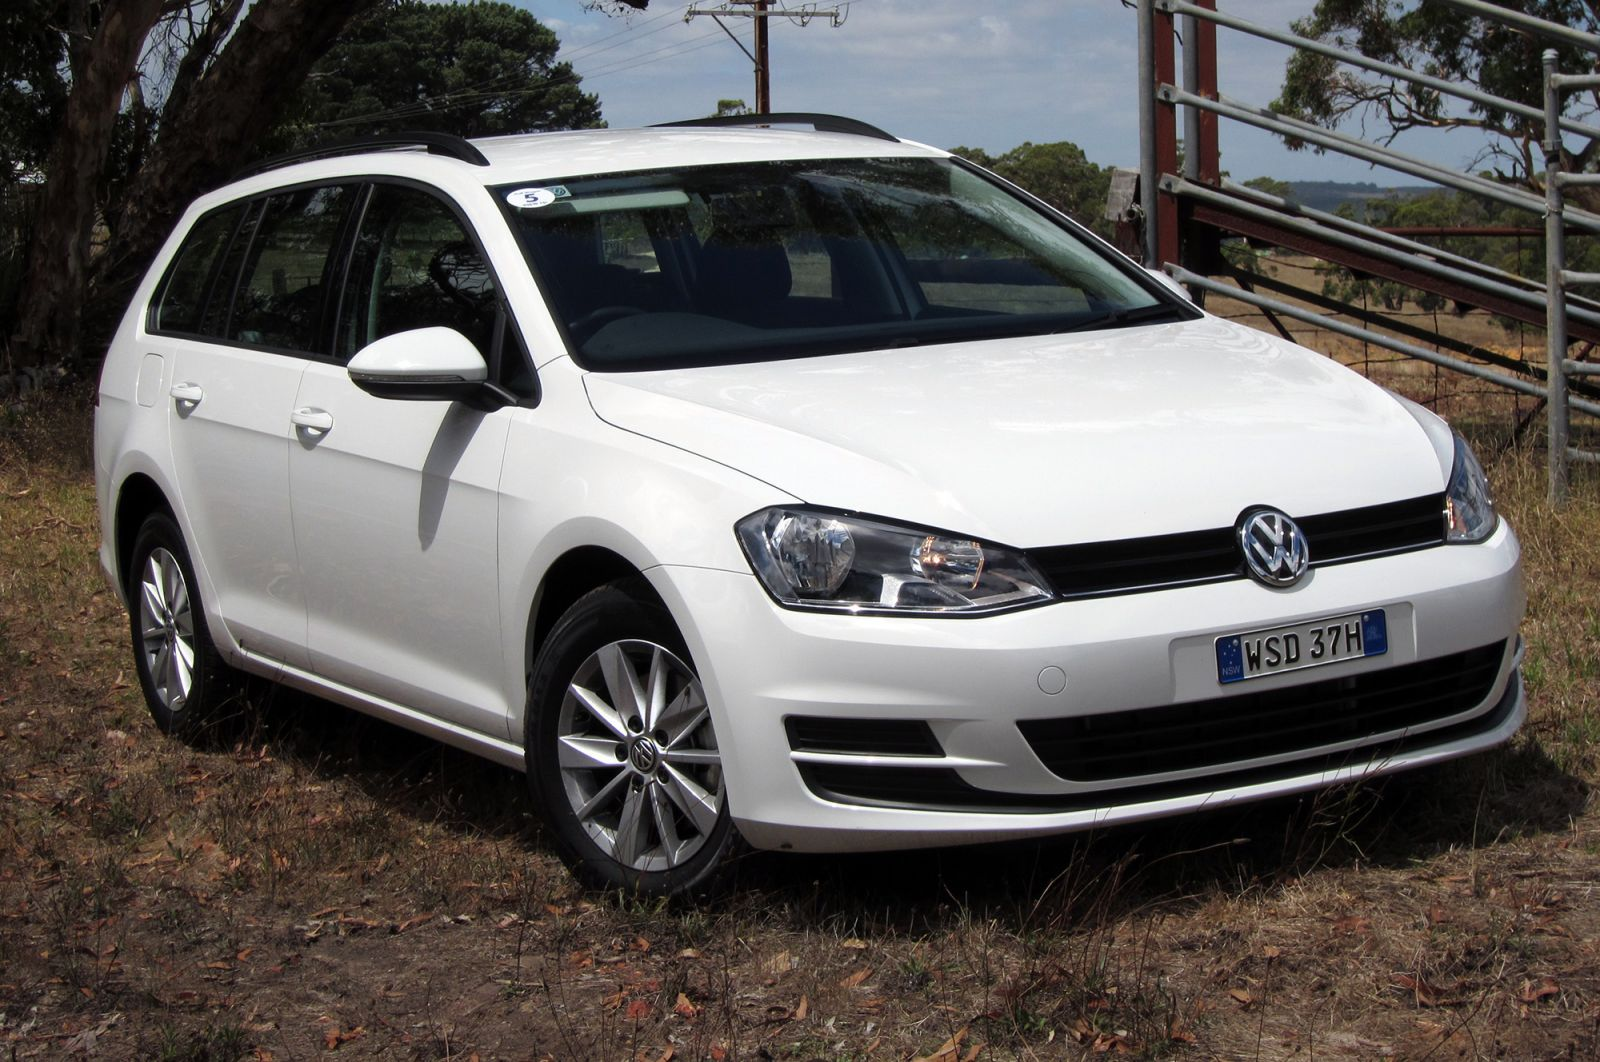 2014 Volkswagen Golf Wagon Review: 90TSI, 103TSI, 110TDI